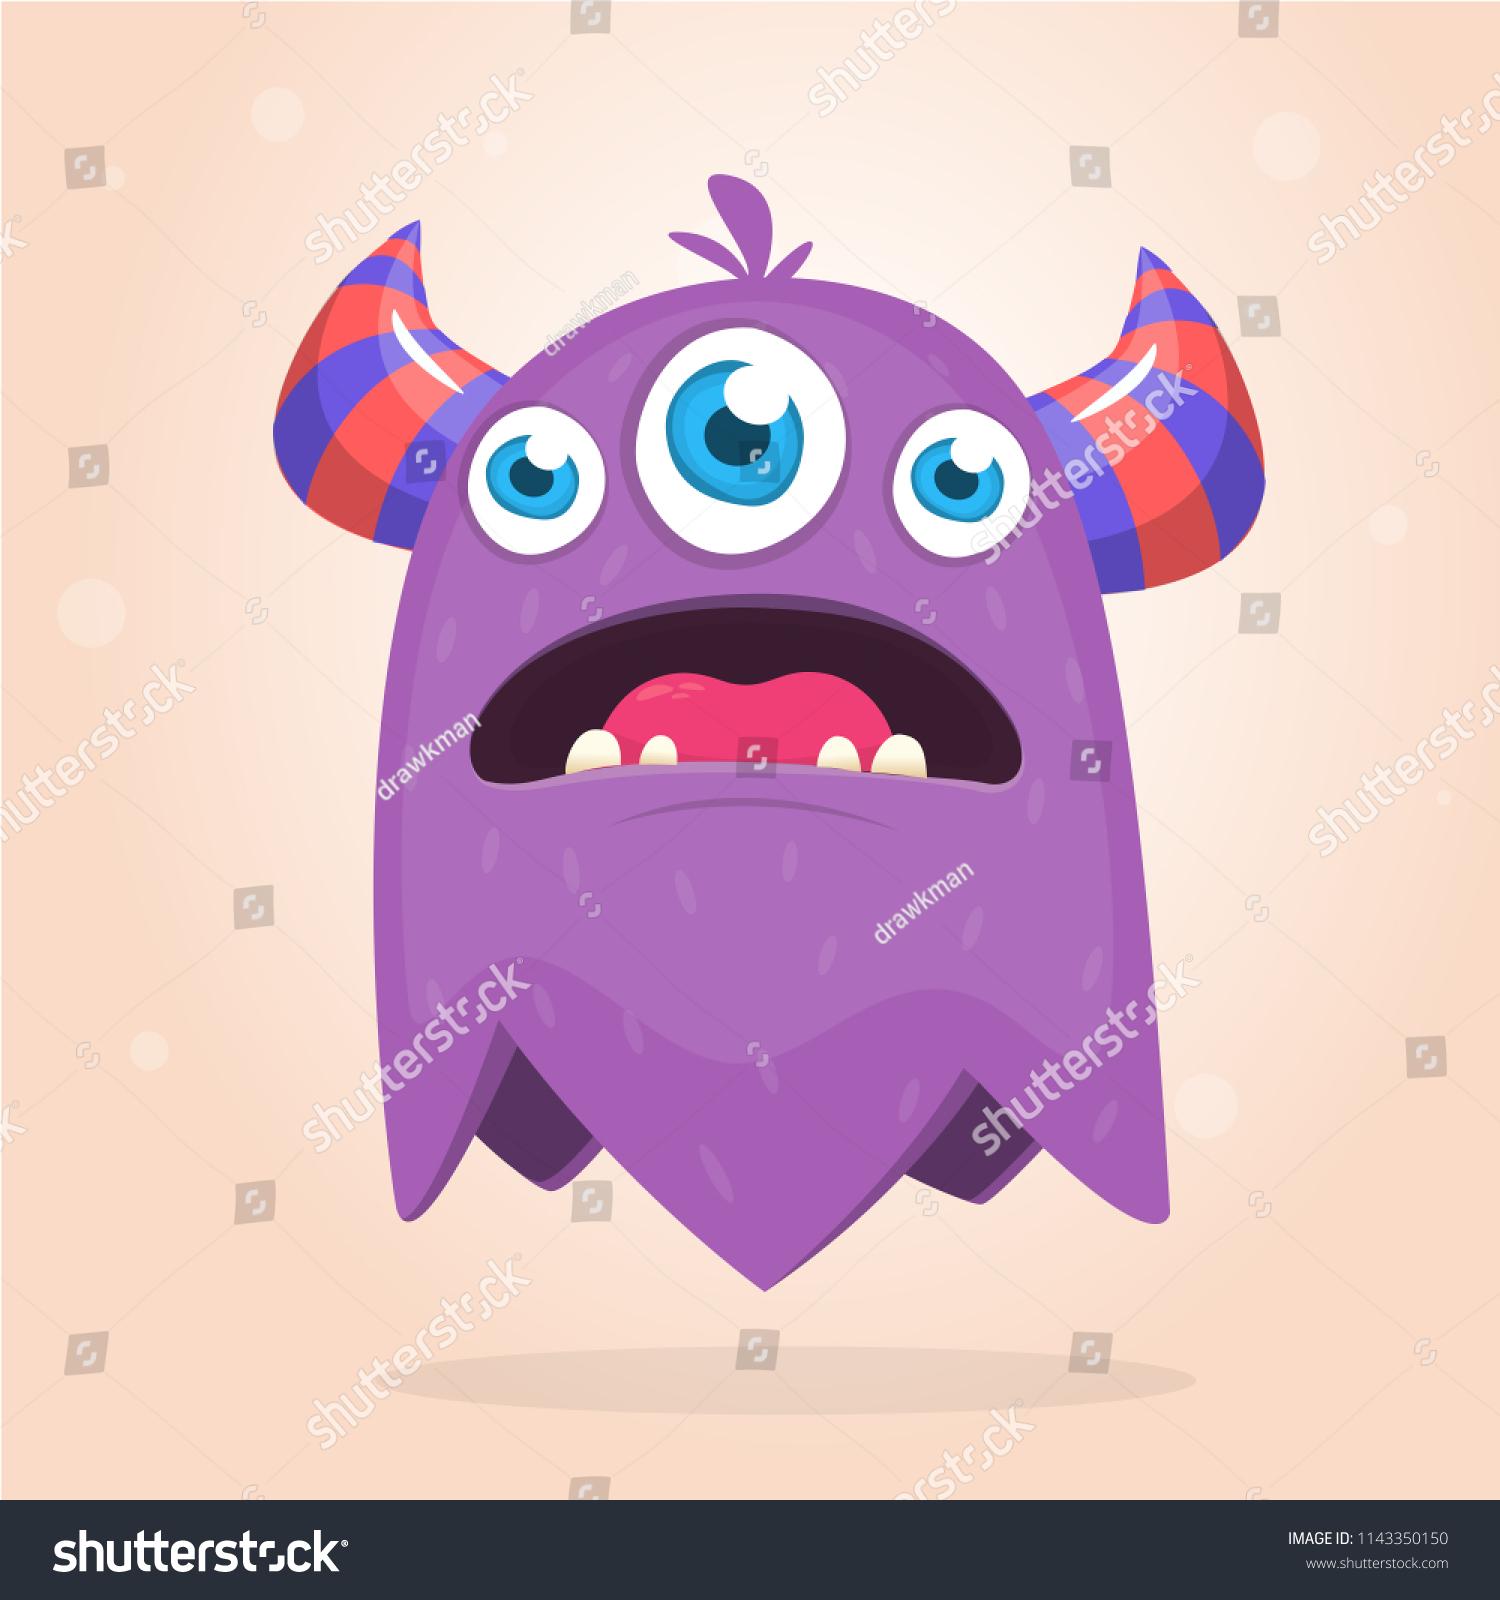 Angry Purple Cartoon Monster Horns Three Stock Vector Royalty Free 1143350150